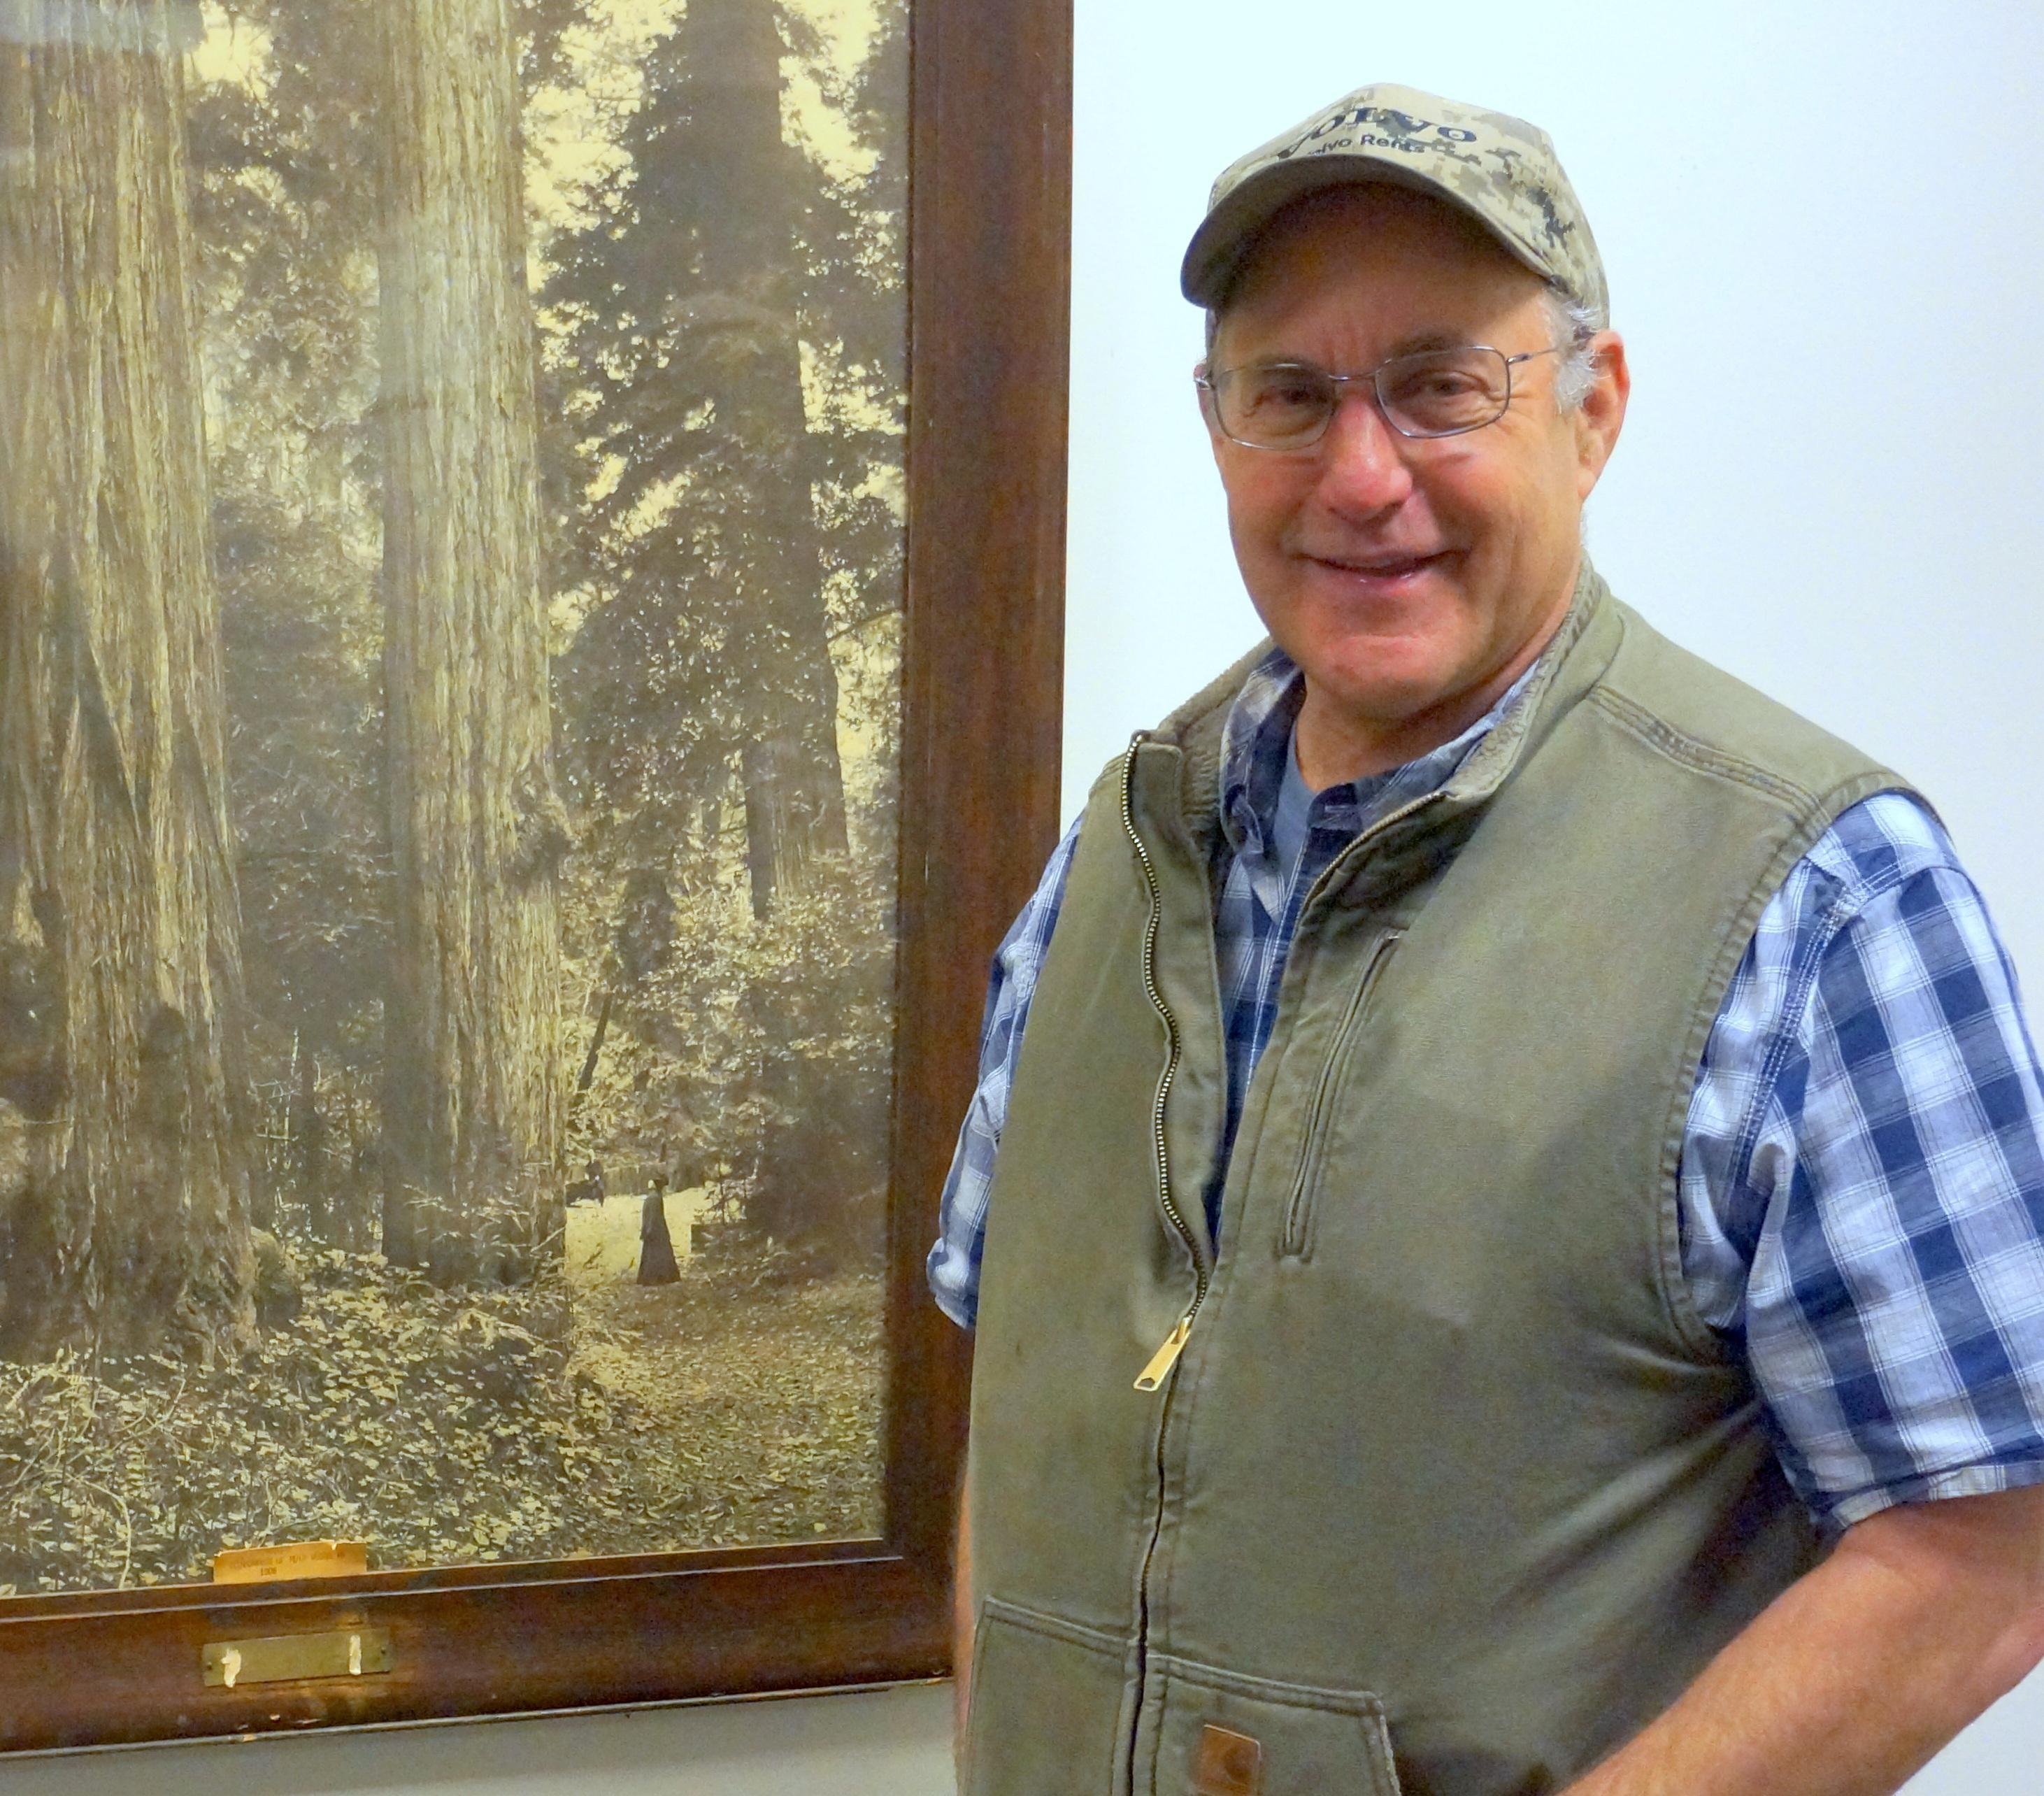 Steve Potts - May 7, 2014 Mill Valley Historical Society